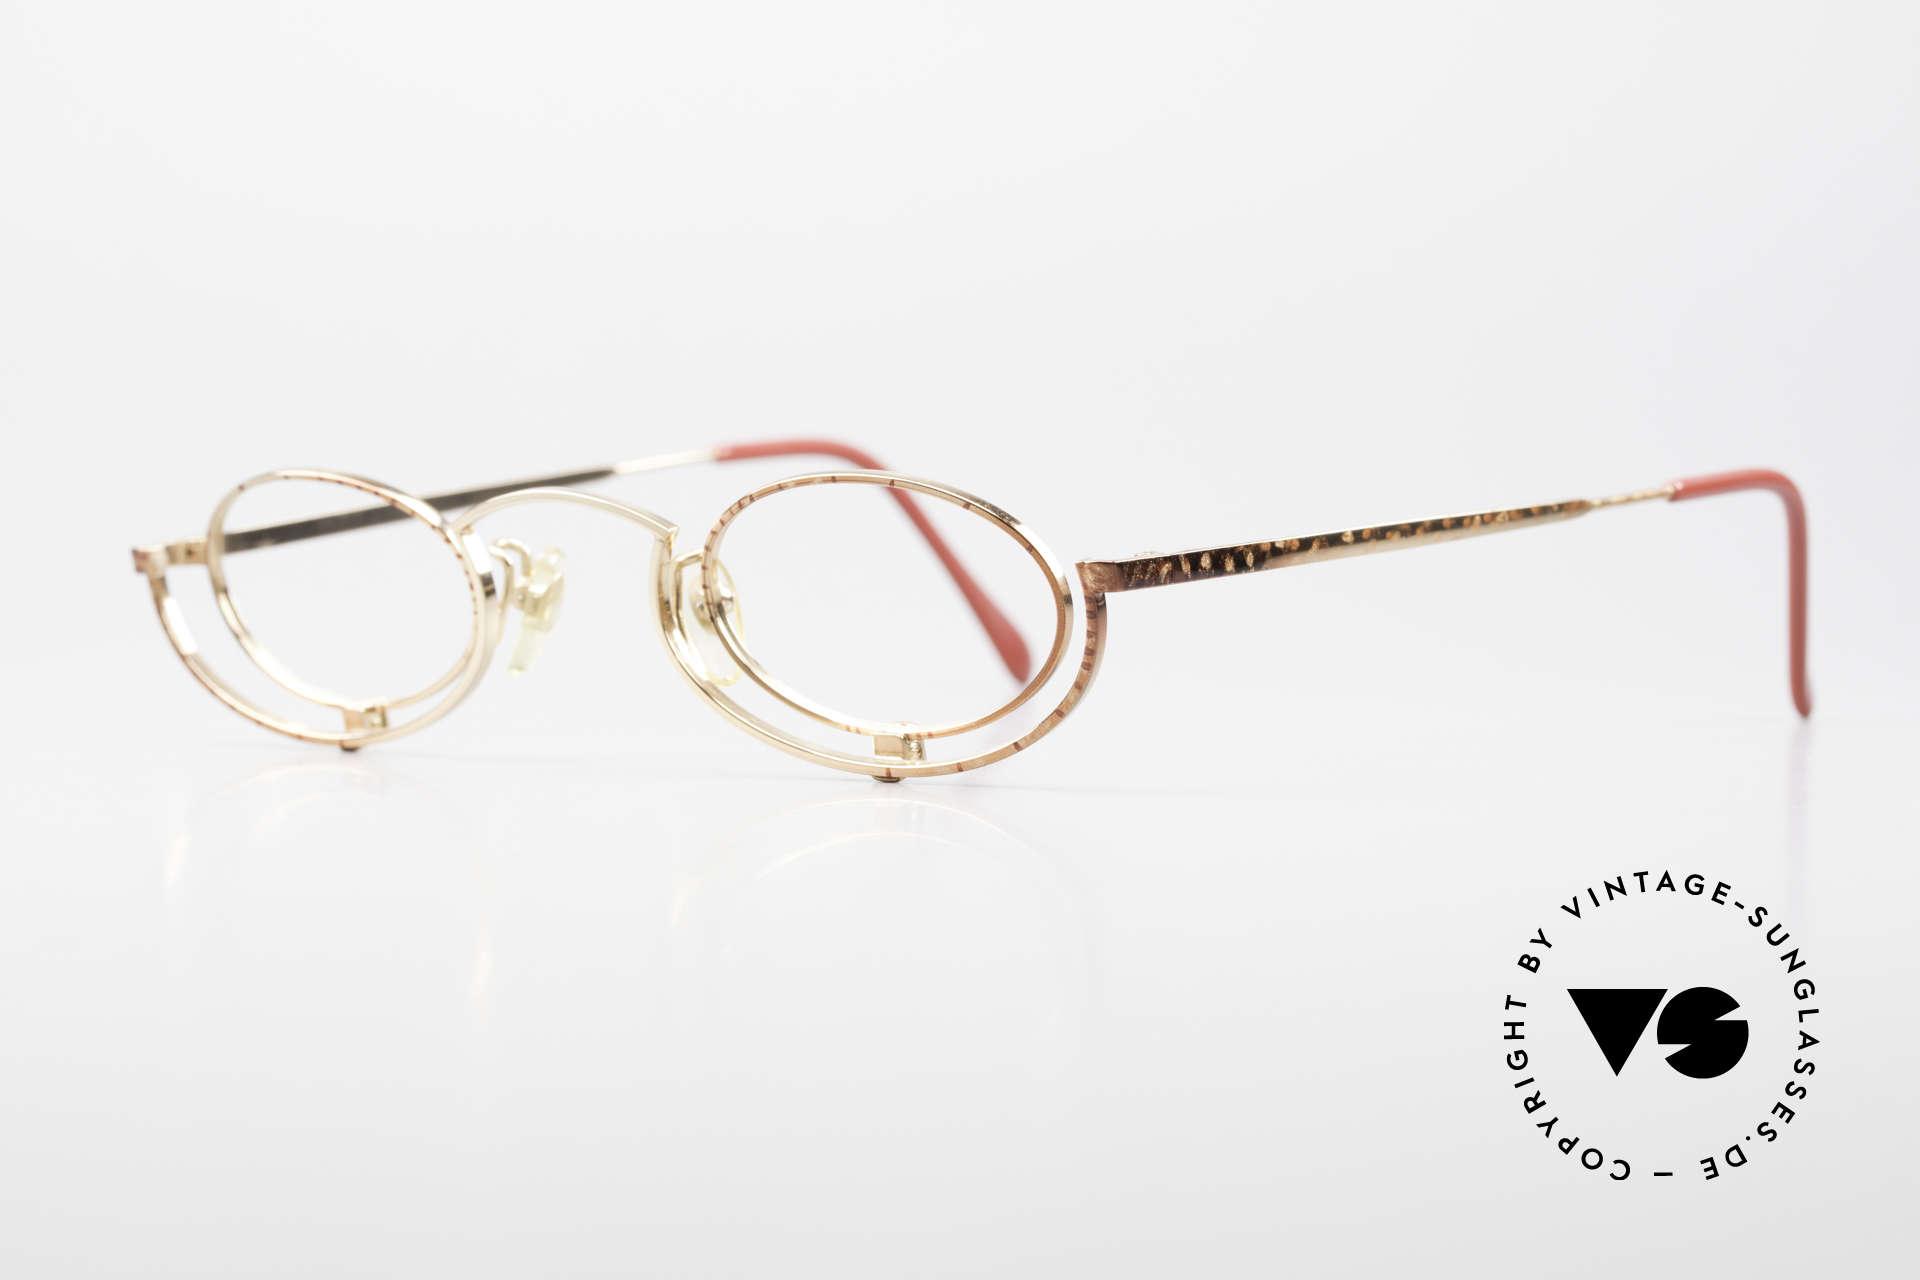 Casanova LC35 Crazy Designer Reading Glasses, top-notch craftsmanship & very subtle frame pattern, Made for Women